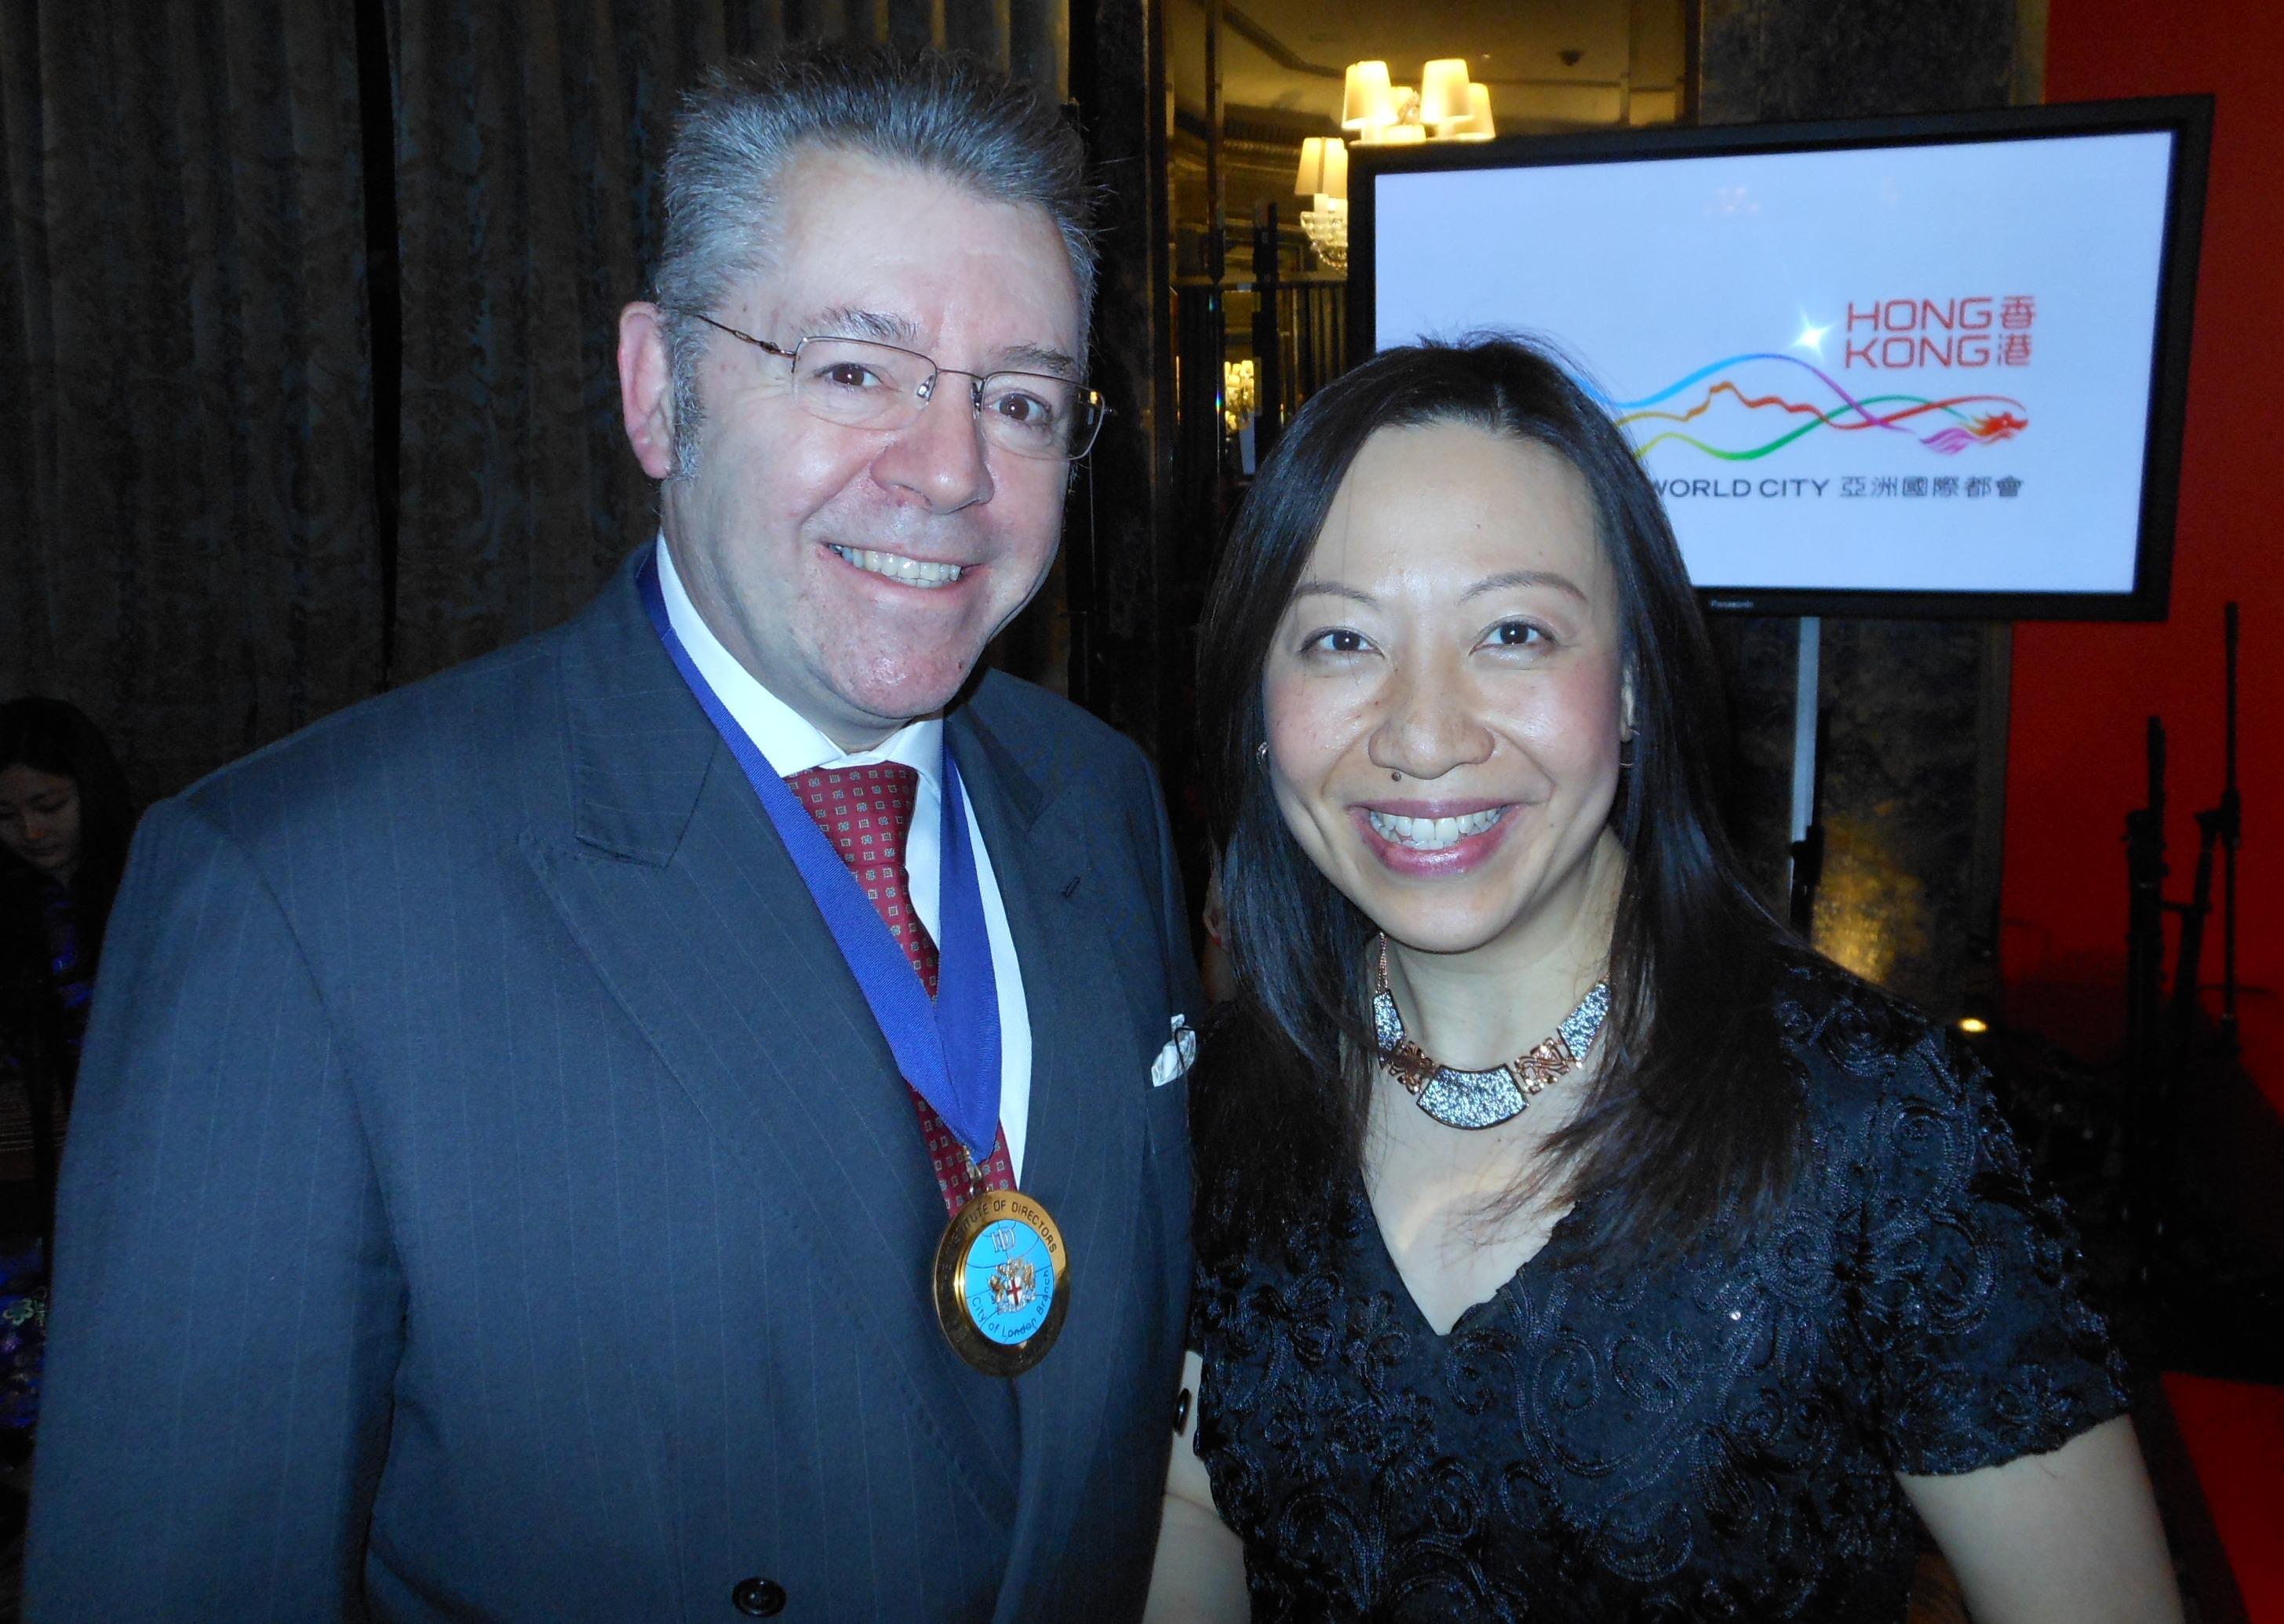 Priscilla To, Director General of HKETO & David Stringer-Lamarre